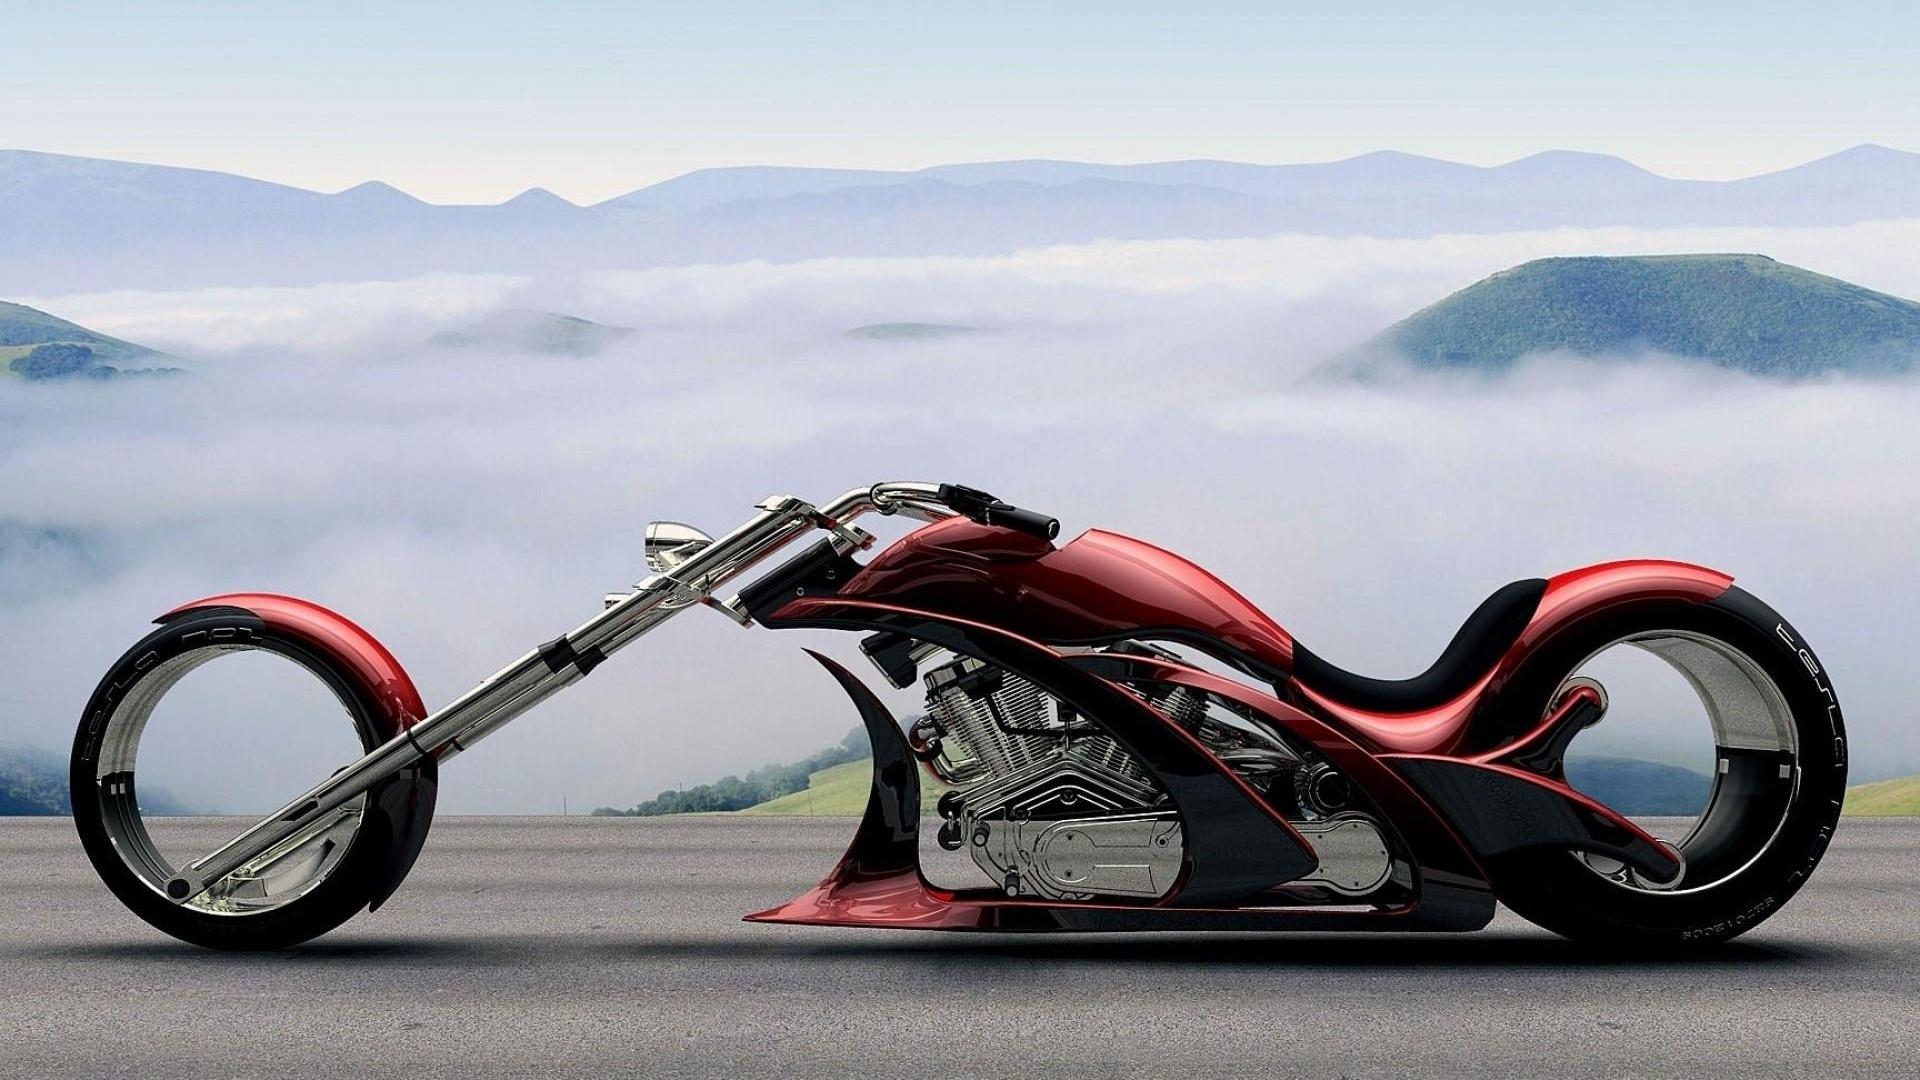 Motorcycle Download Wallpaper